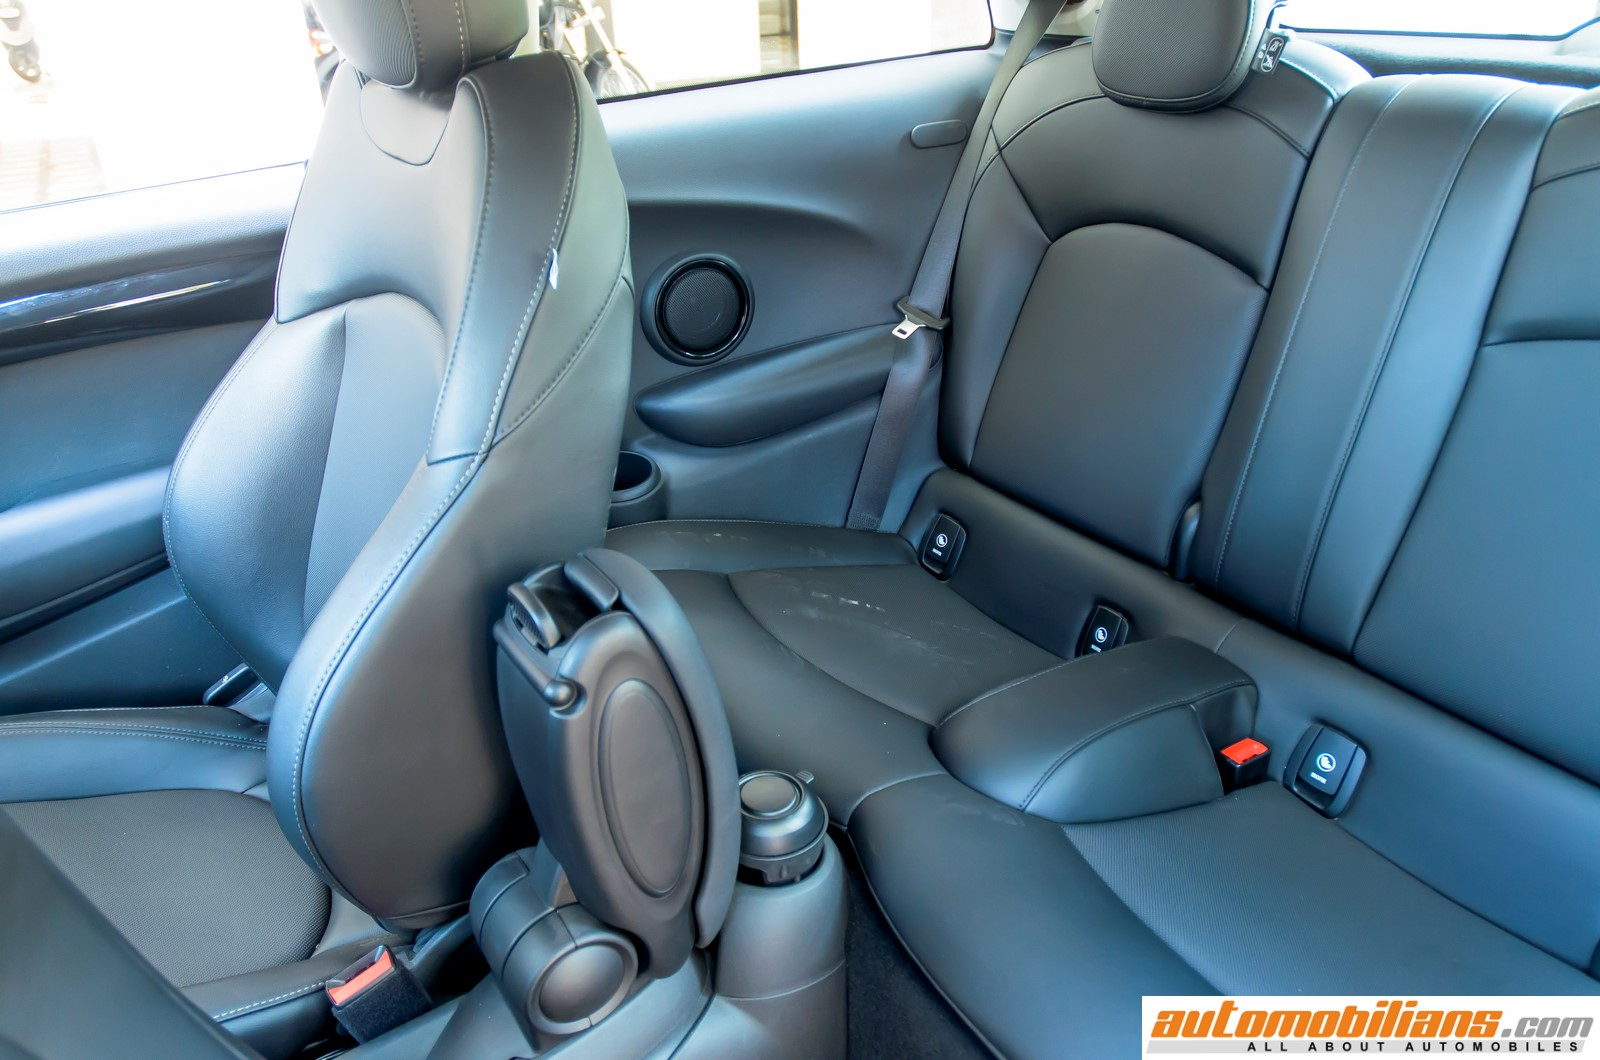 2015 mini cooper 4 door interior. 2015 mini cooper d 3door hardtop rear seats interior automobilians mini 4 door